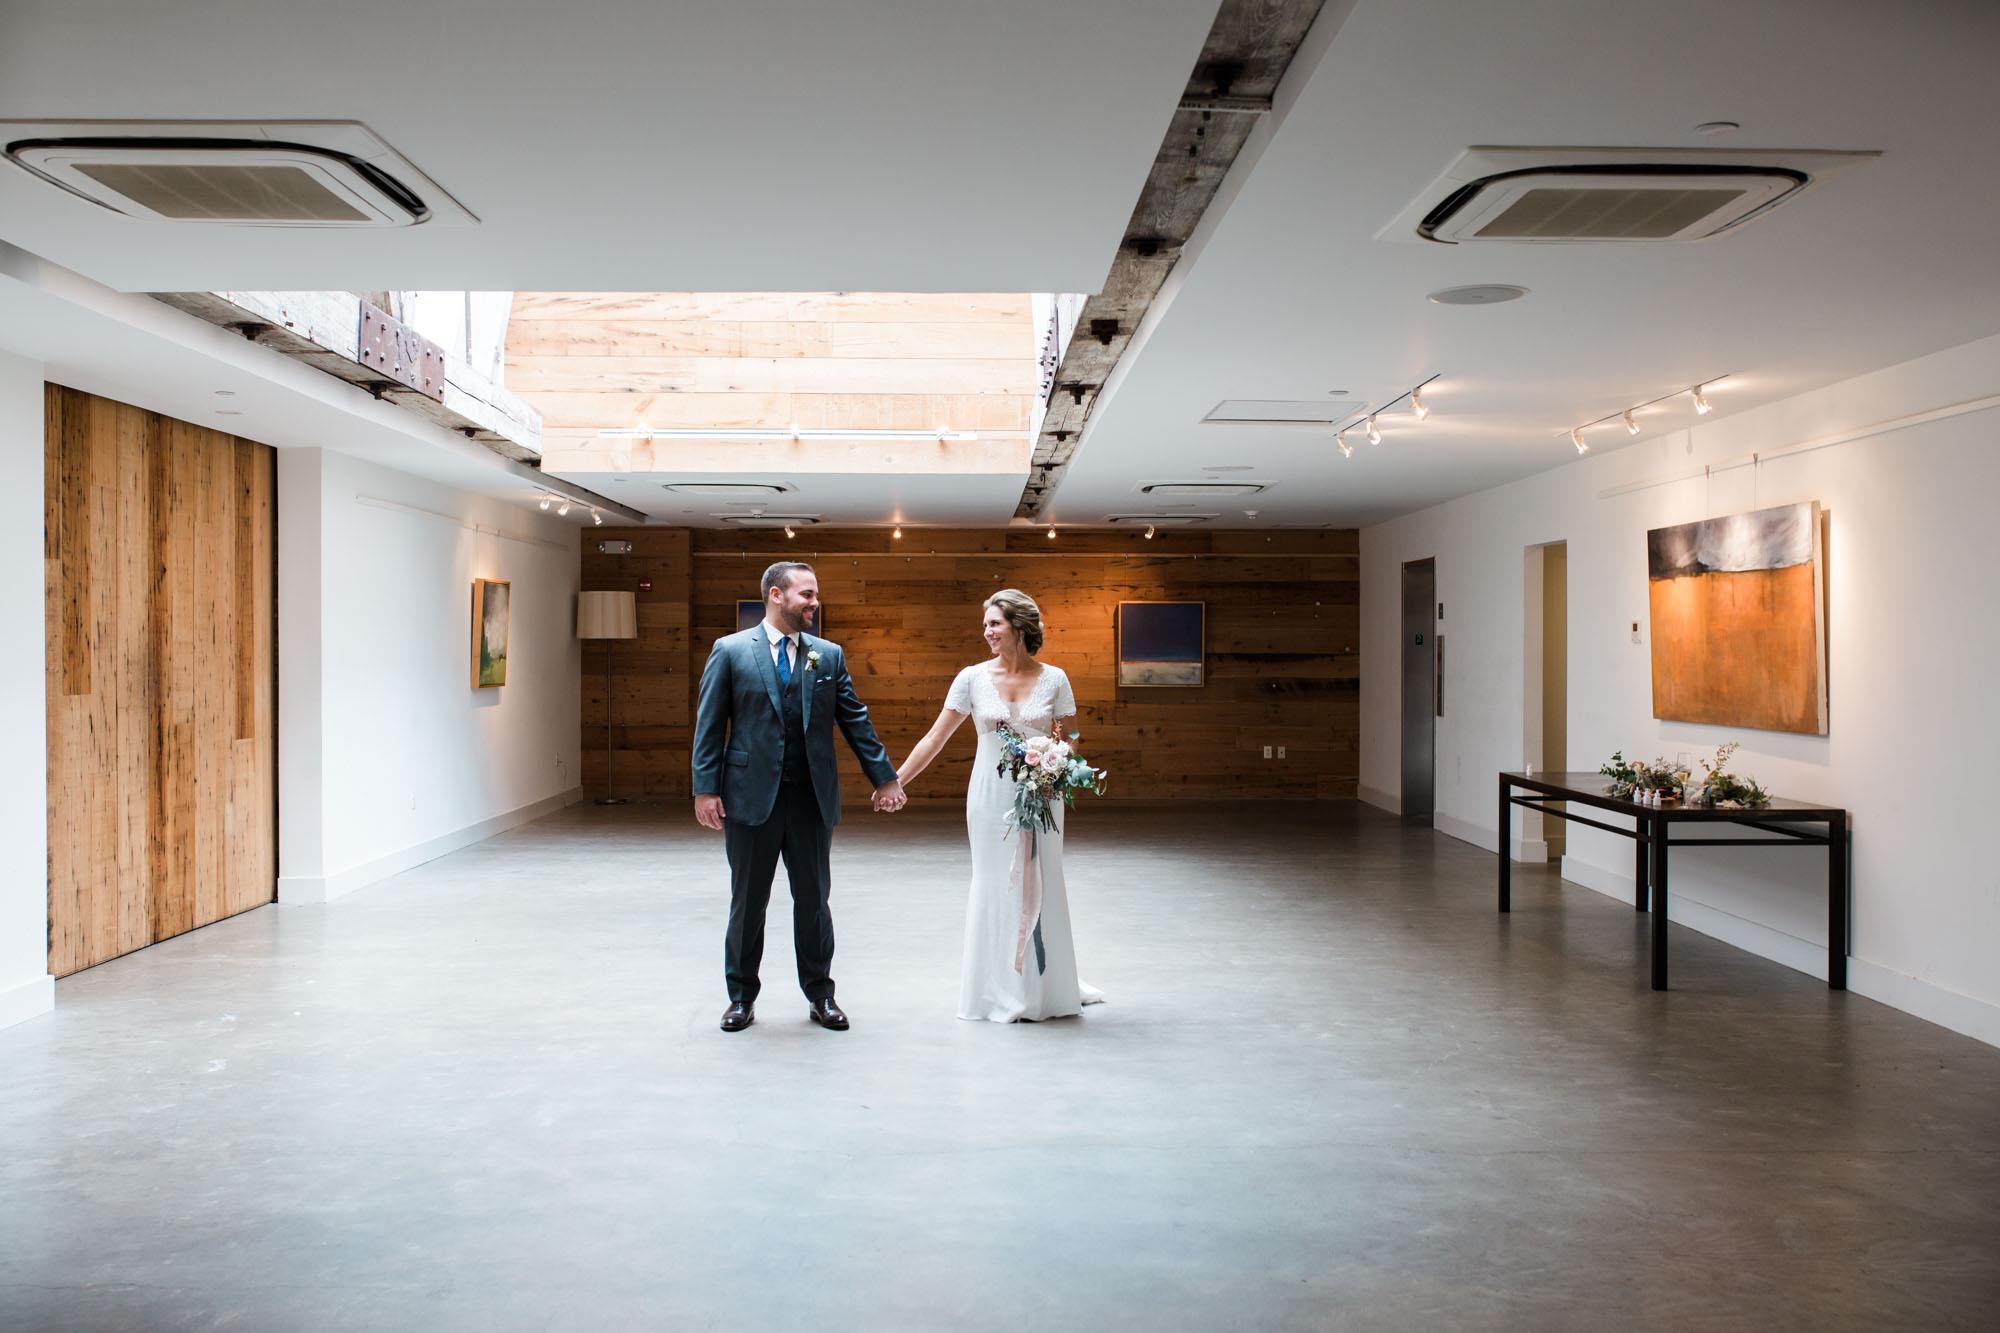 Brian & Dina || An Upstate New York Dream Wedding